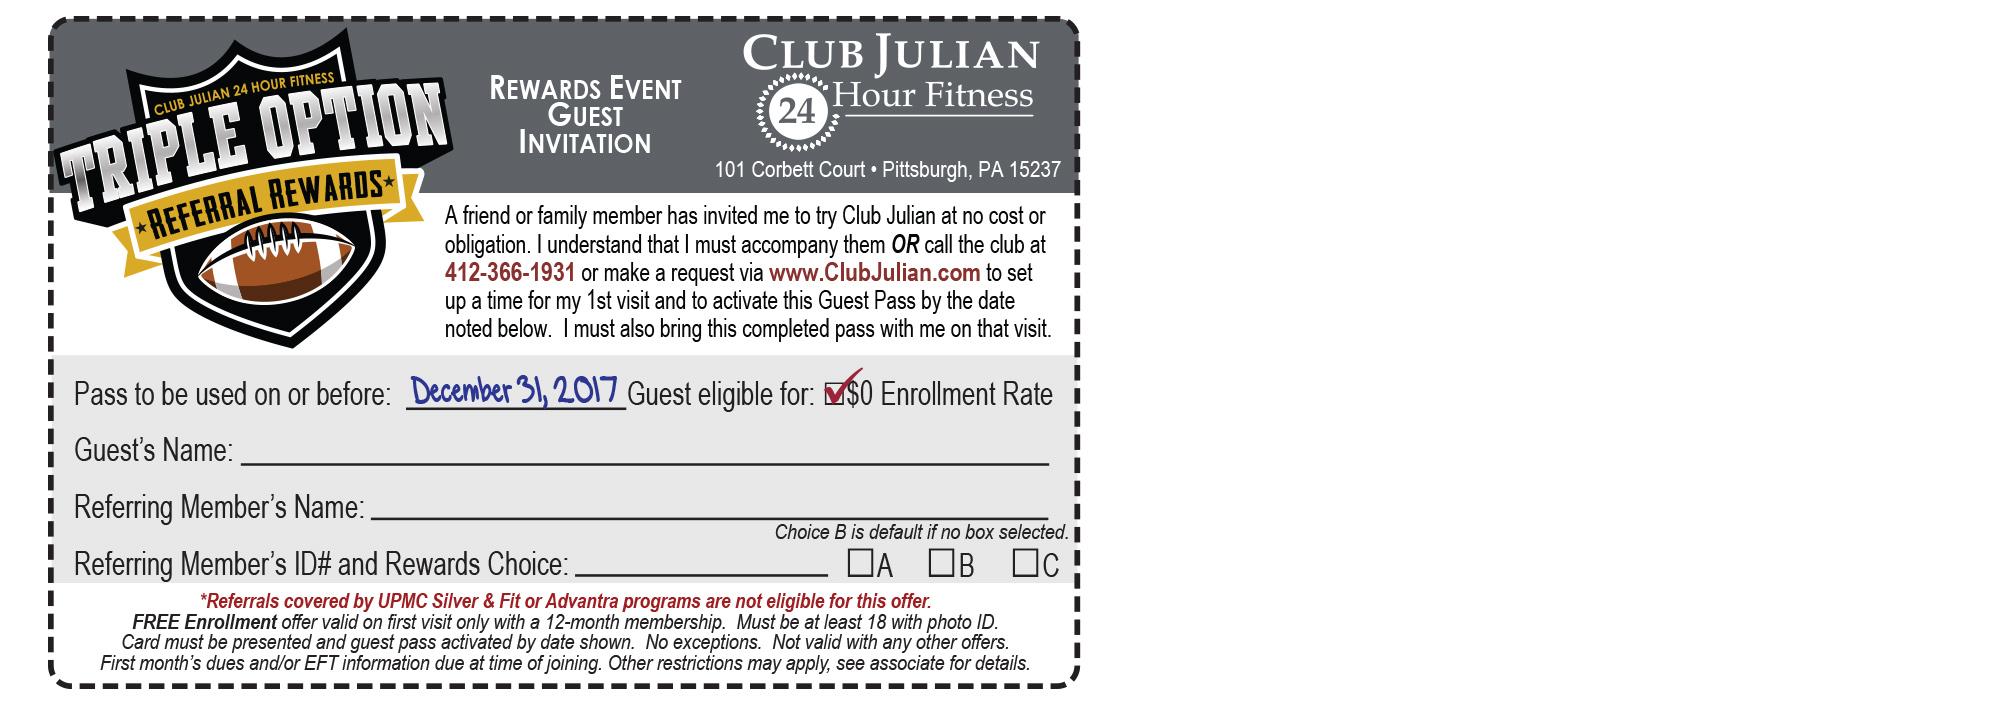 2017 Triple Option Referral Guest Pass